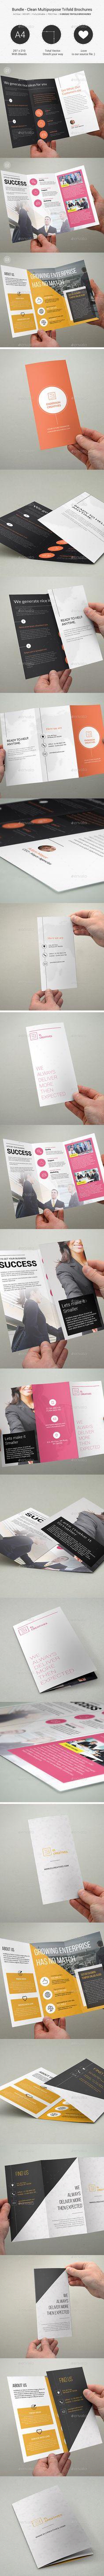 Bundle - Multipurpose Trifold Brochures PSD Template #design Download: http://graphicriver.net/item/bundle-multipurpose-trifold-brochures-20/13081156?ref=ksioks